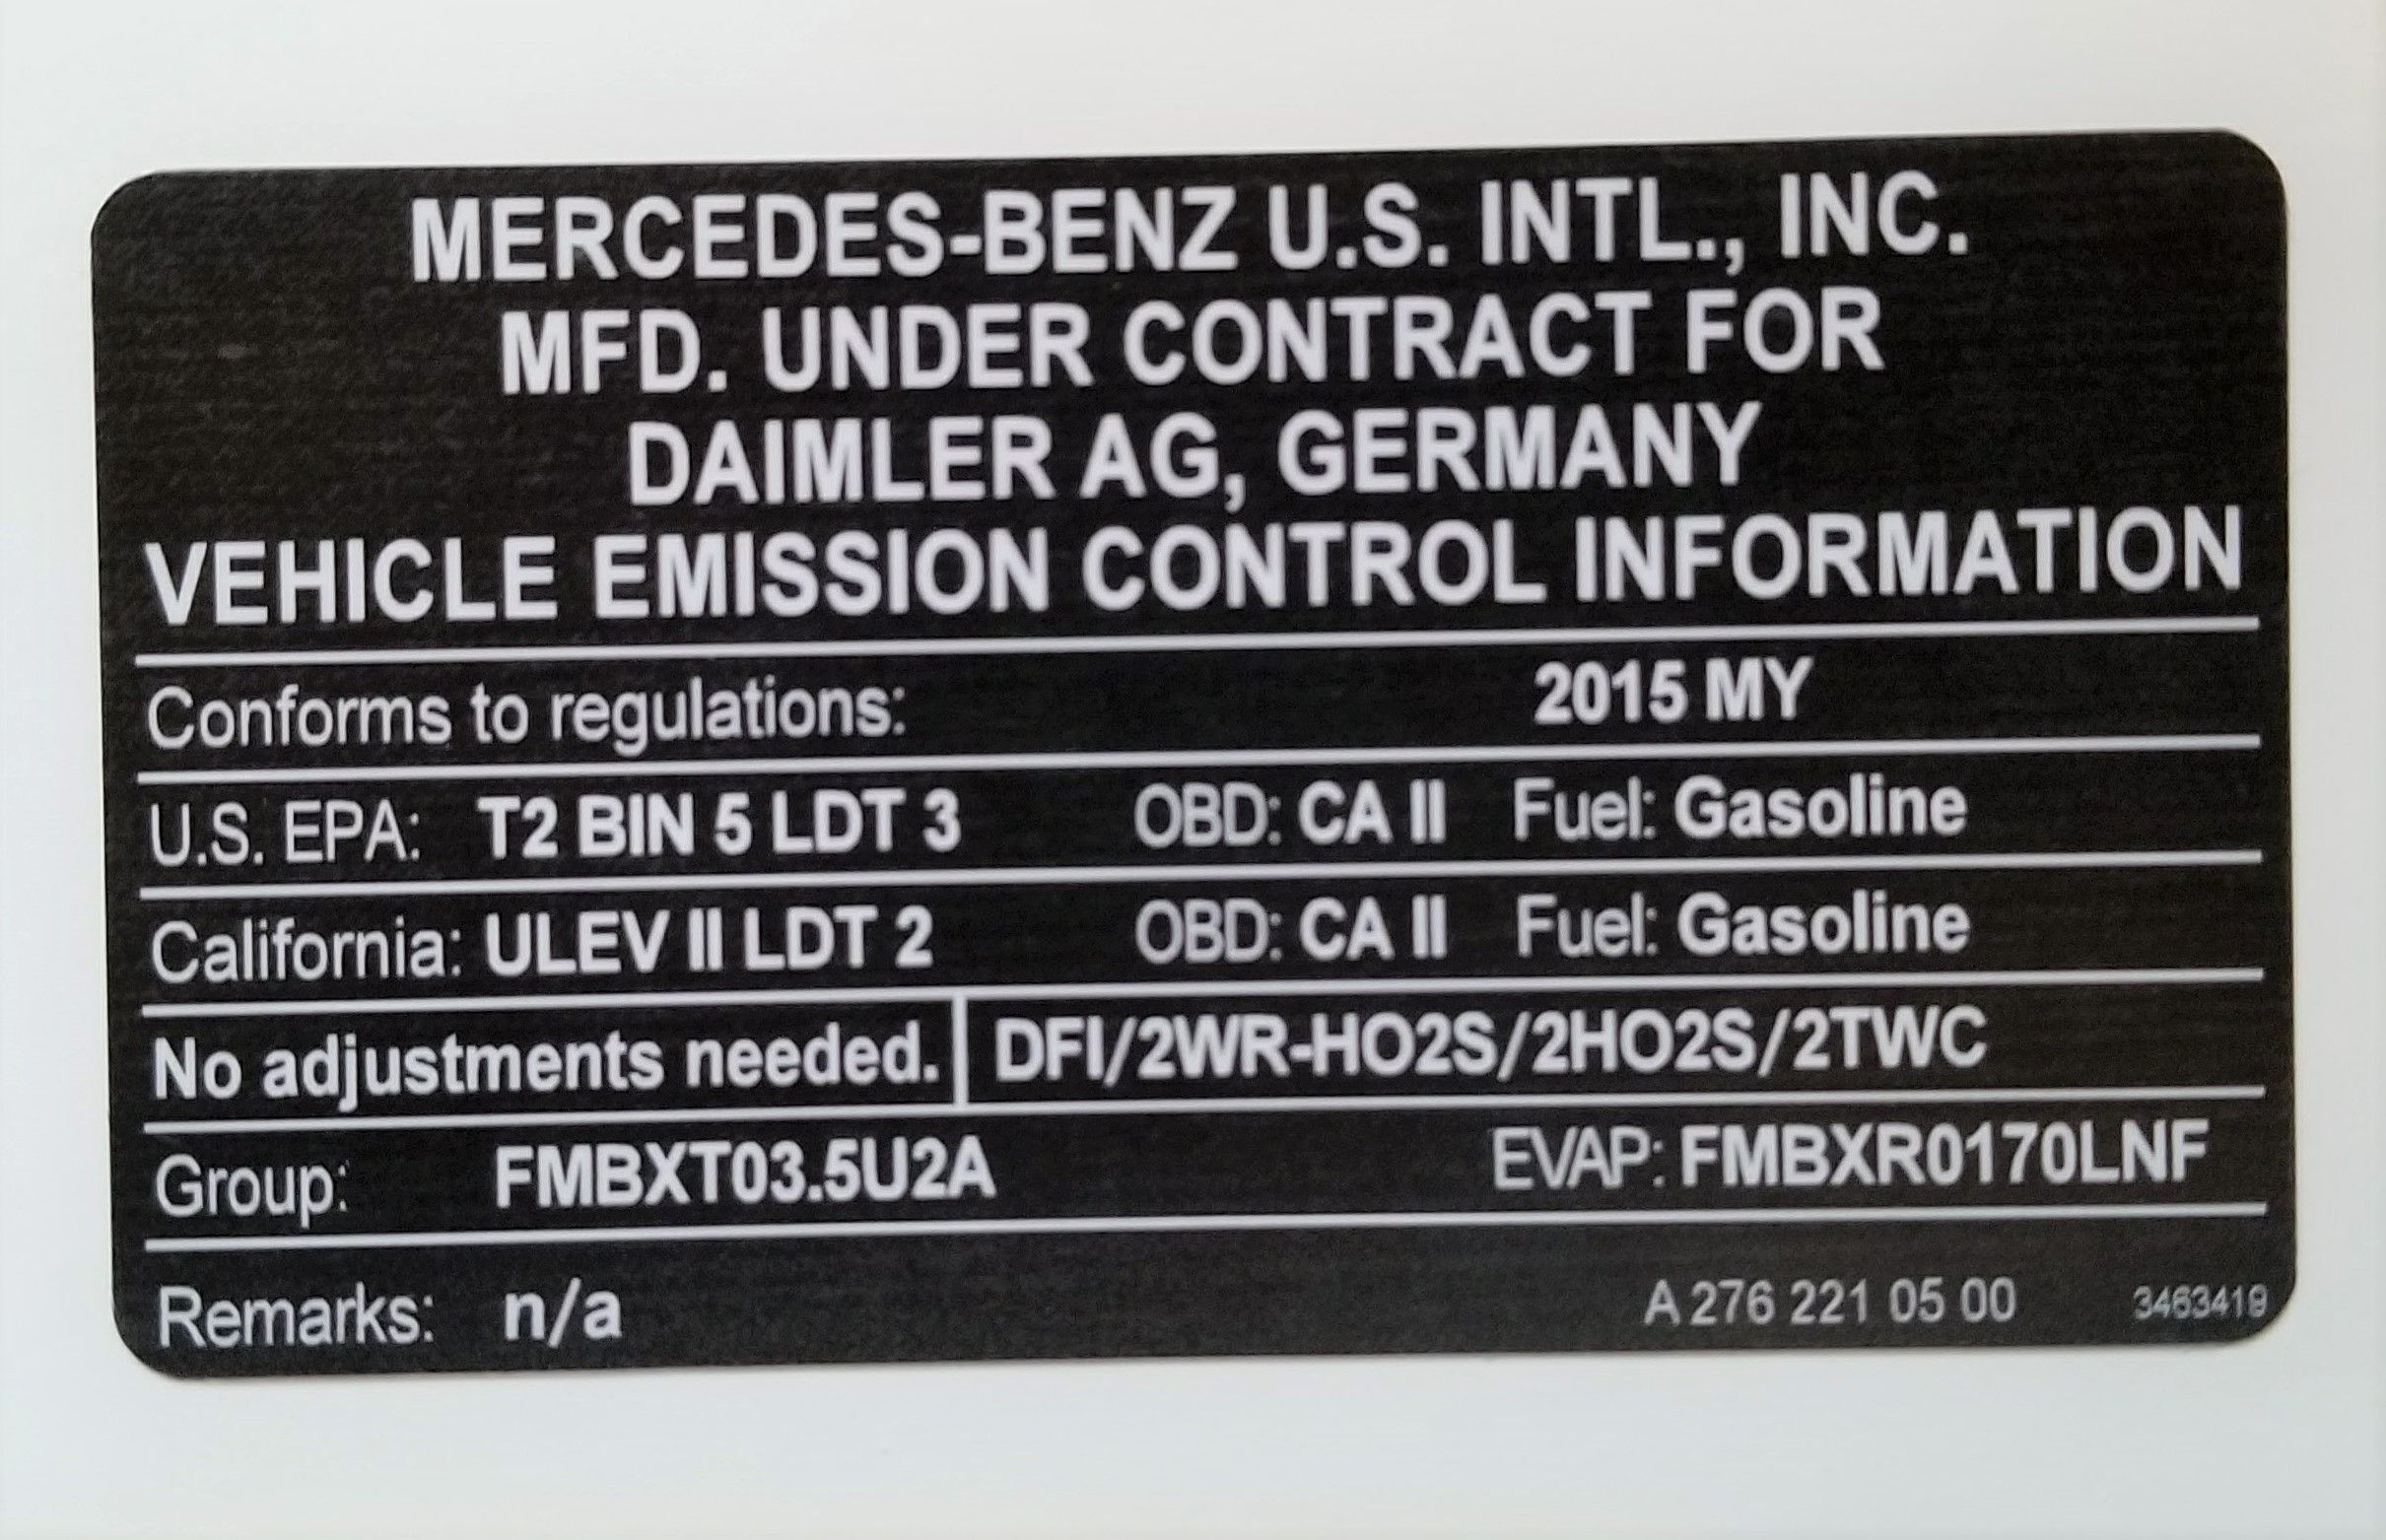 Mercedes Benz Emission Control Sticker Mercedes Benz Mercedes Benz [ 1563 x 2421 Pixel ]